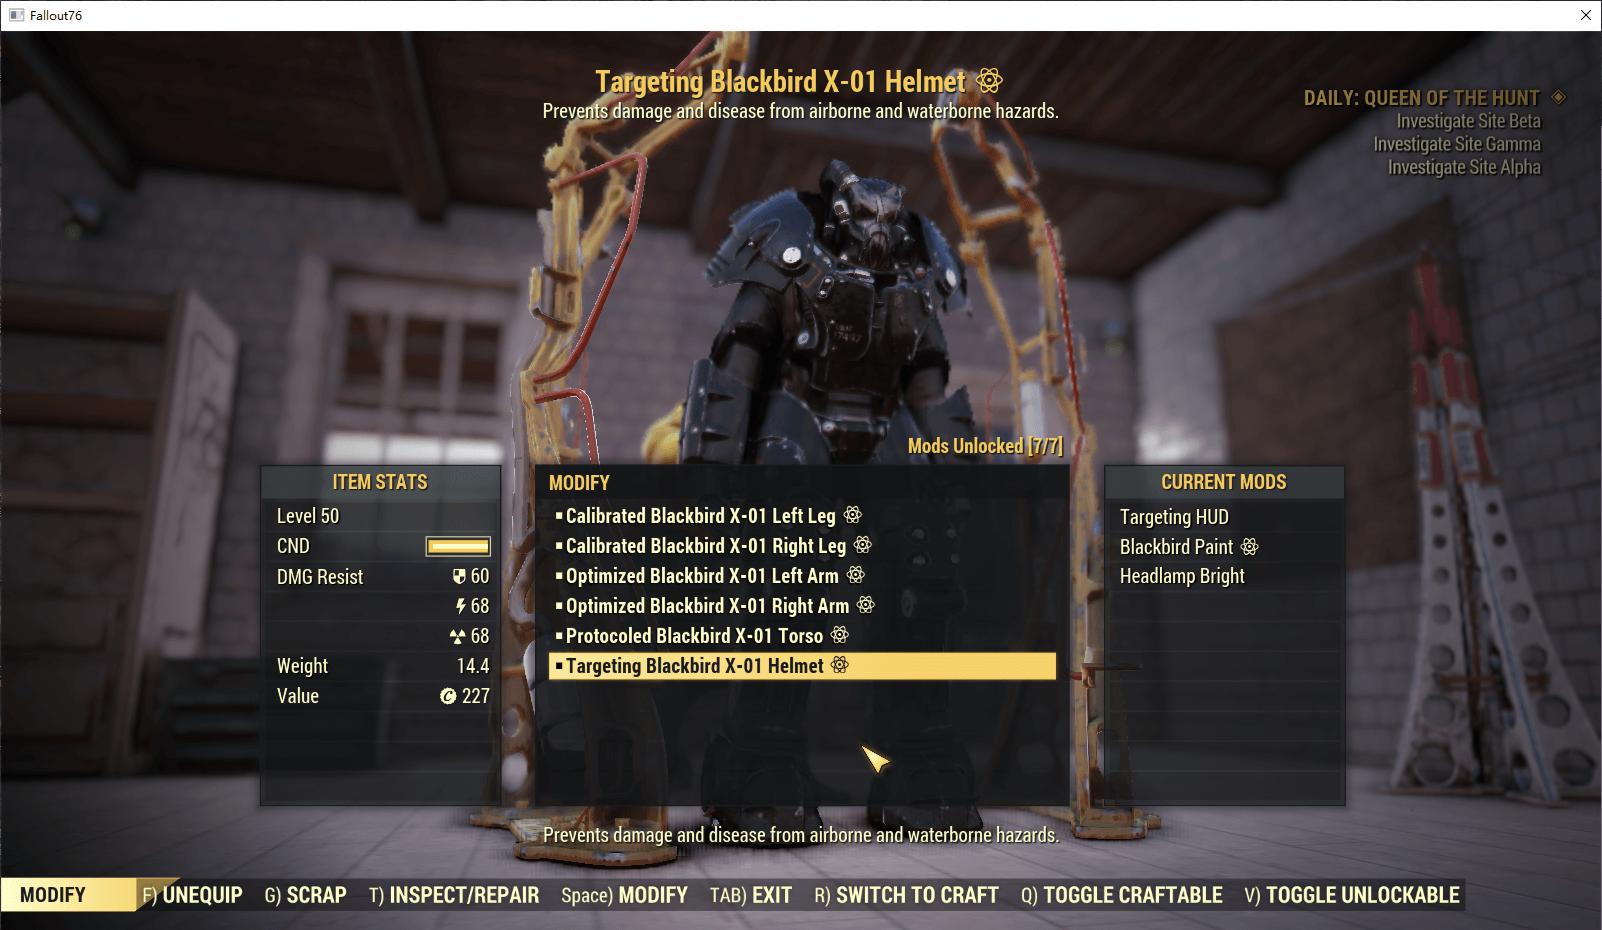 Full set Optimized X-01 Armor(6/6 pieces)